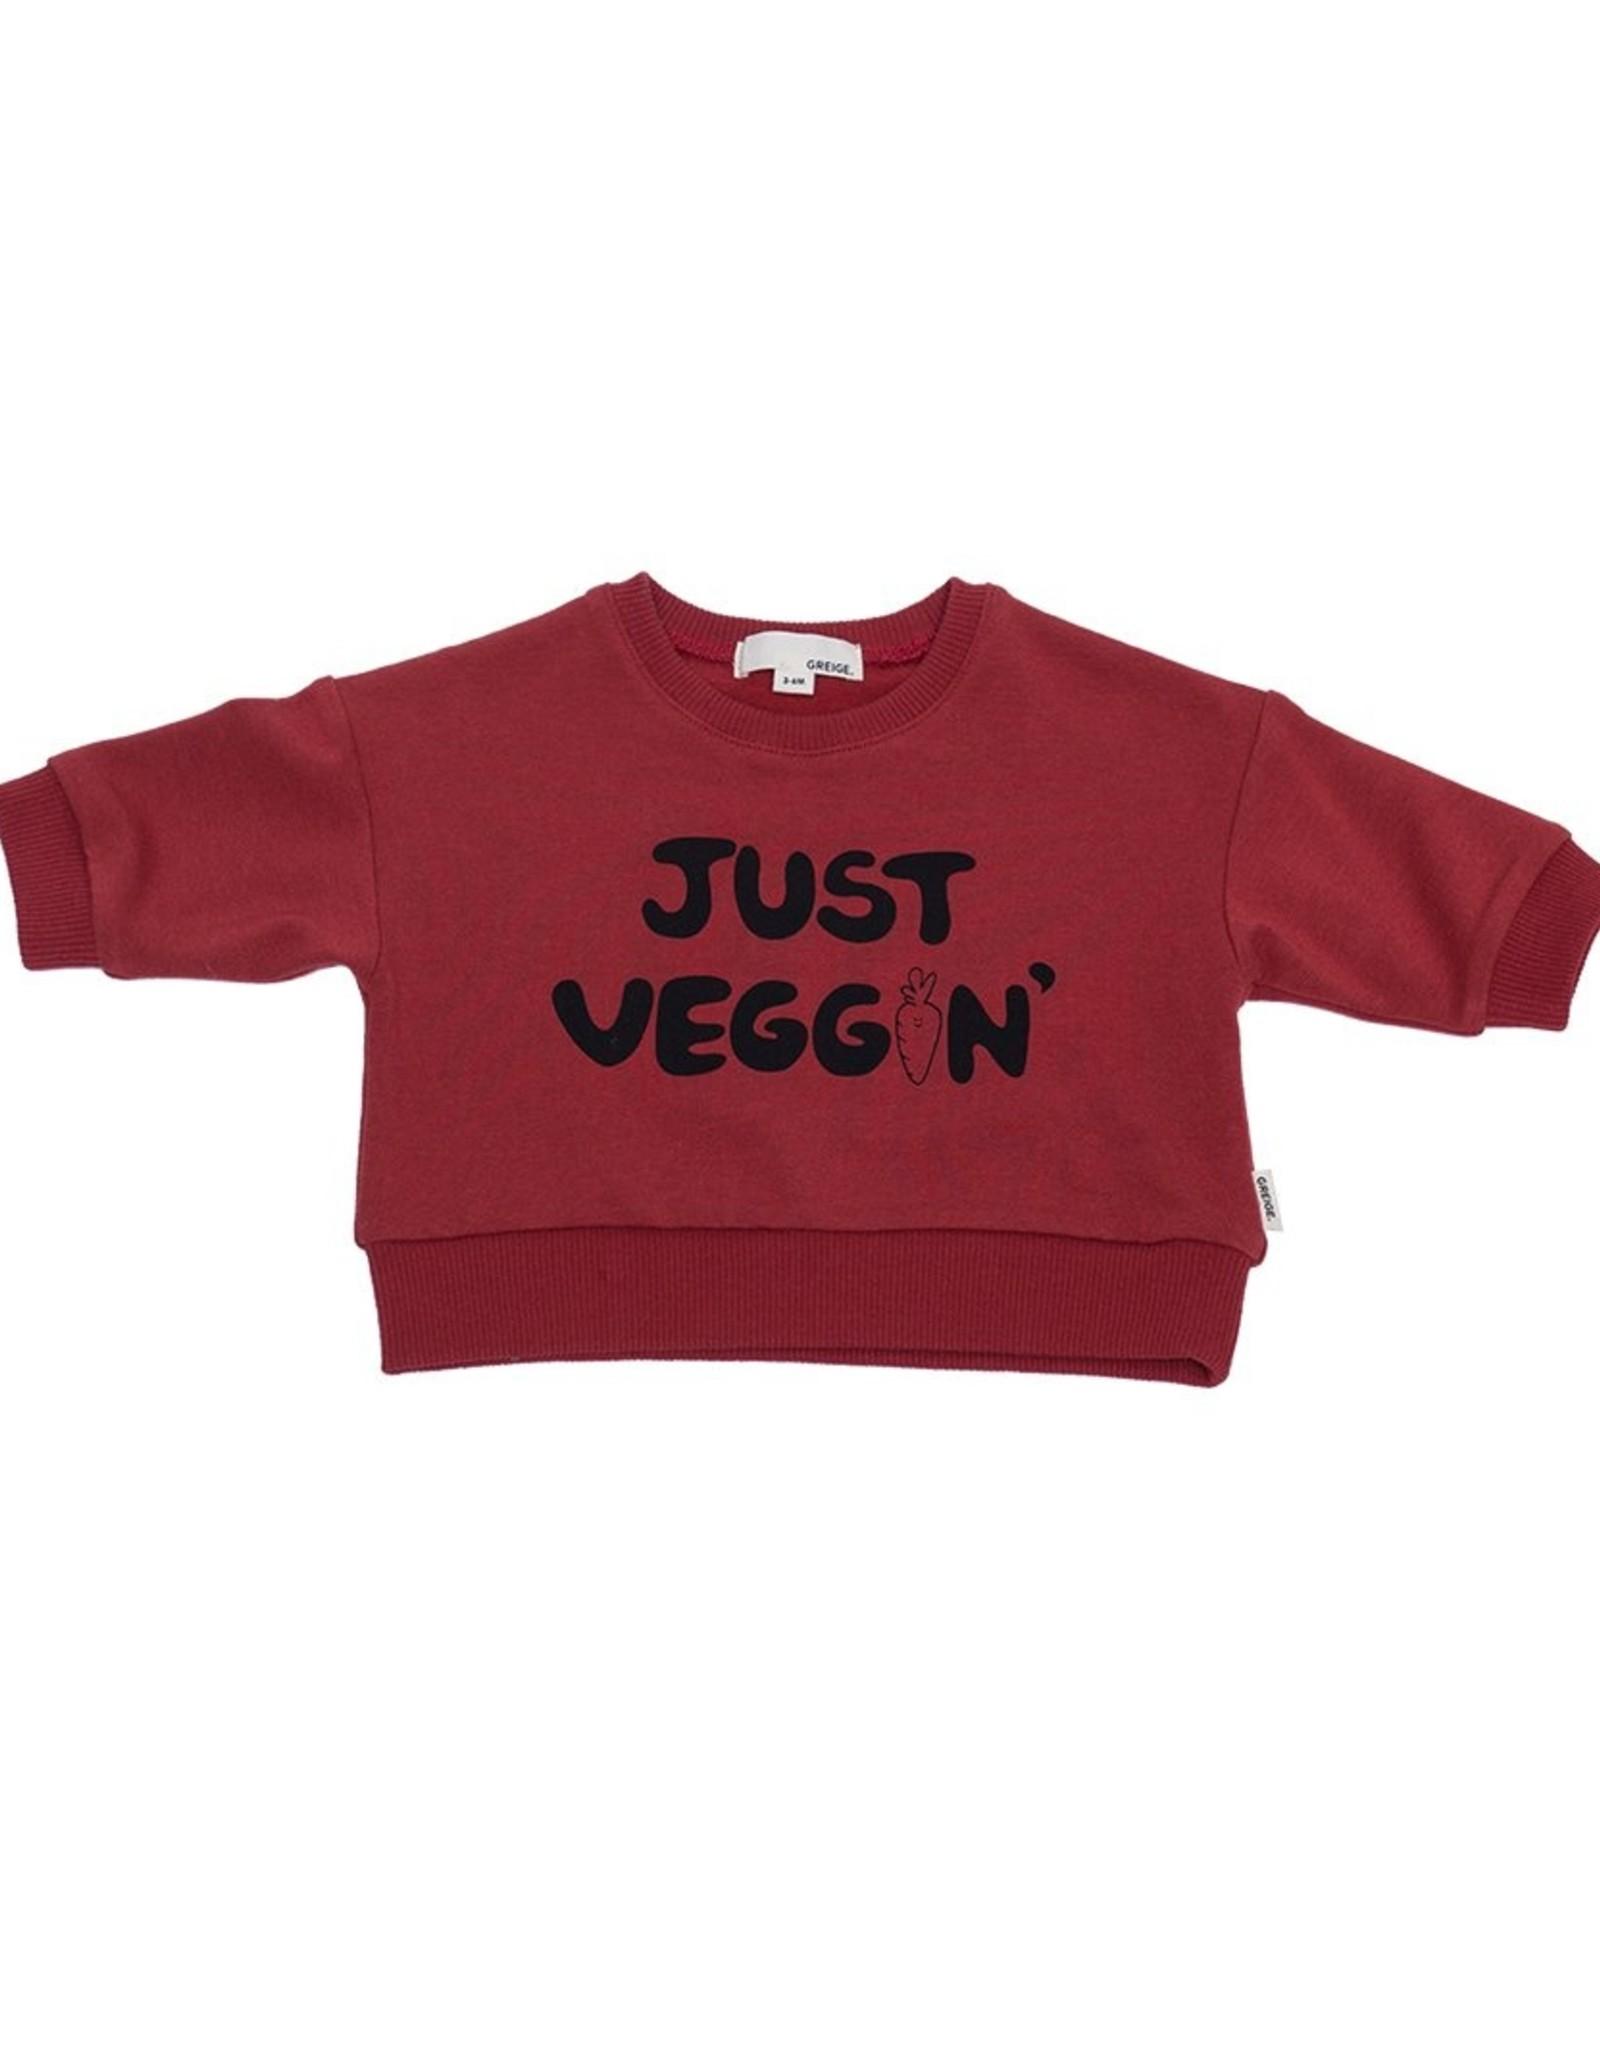 Greige FA21 Just Veggin' Sweatshirt